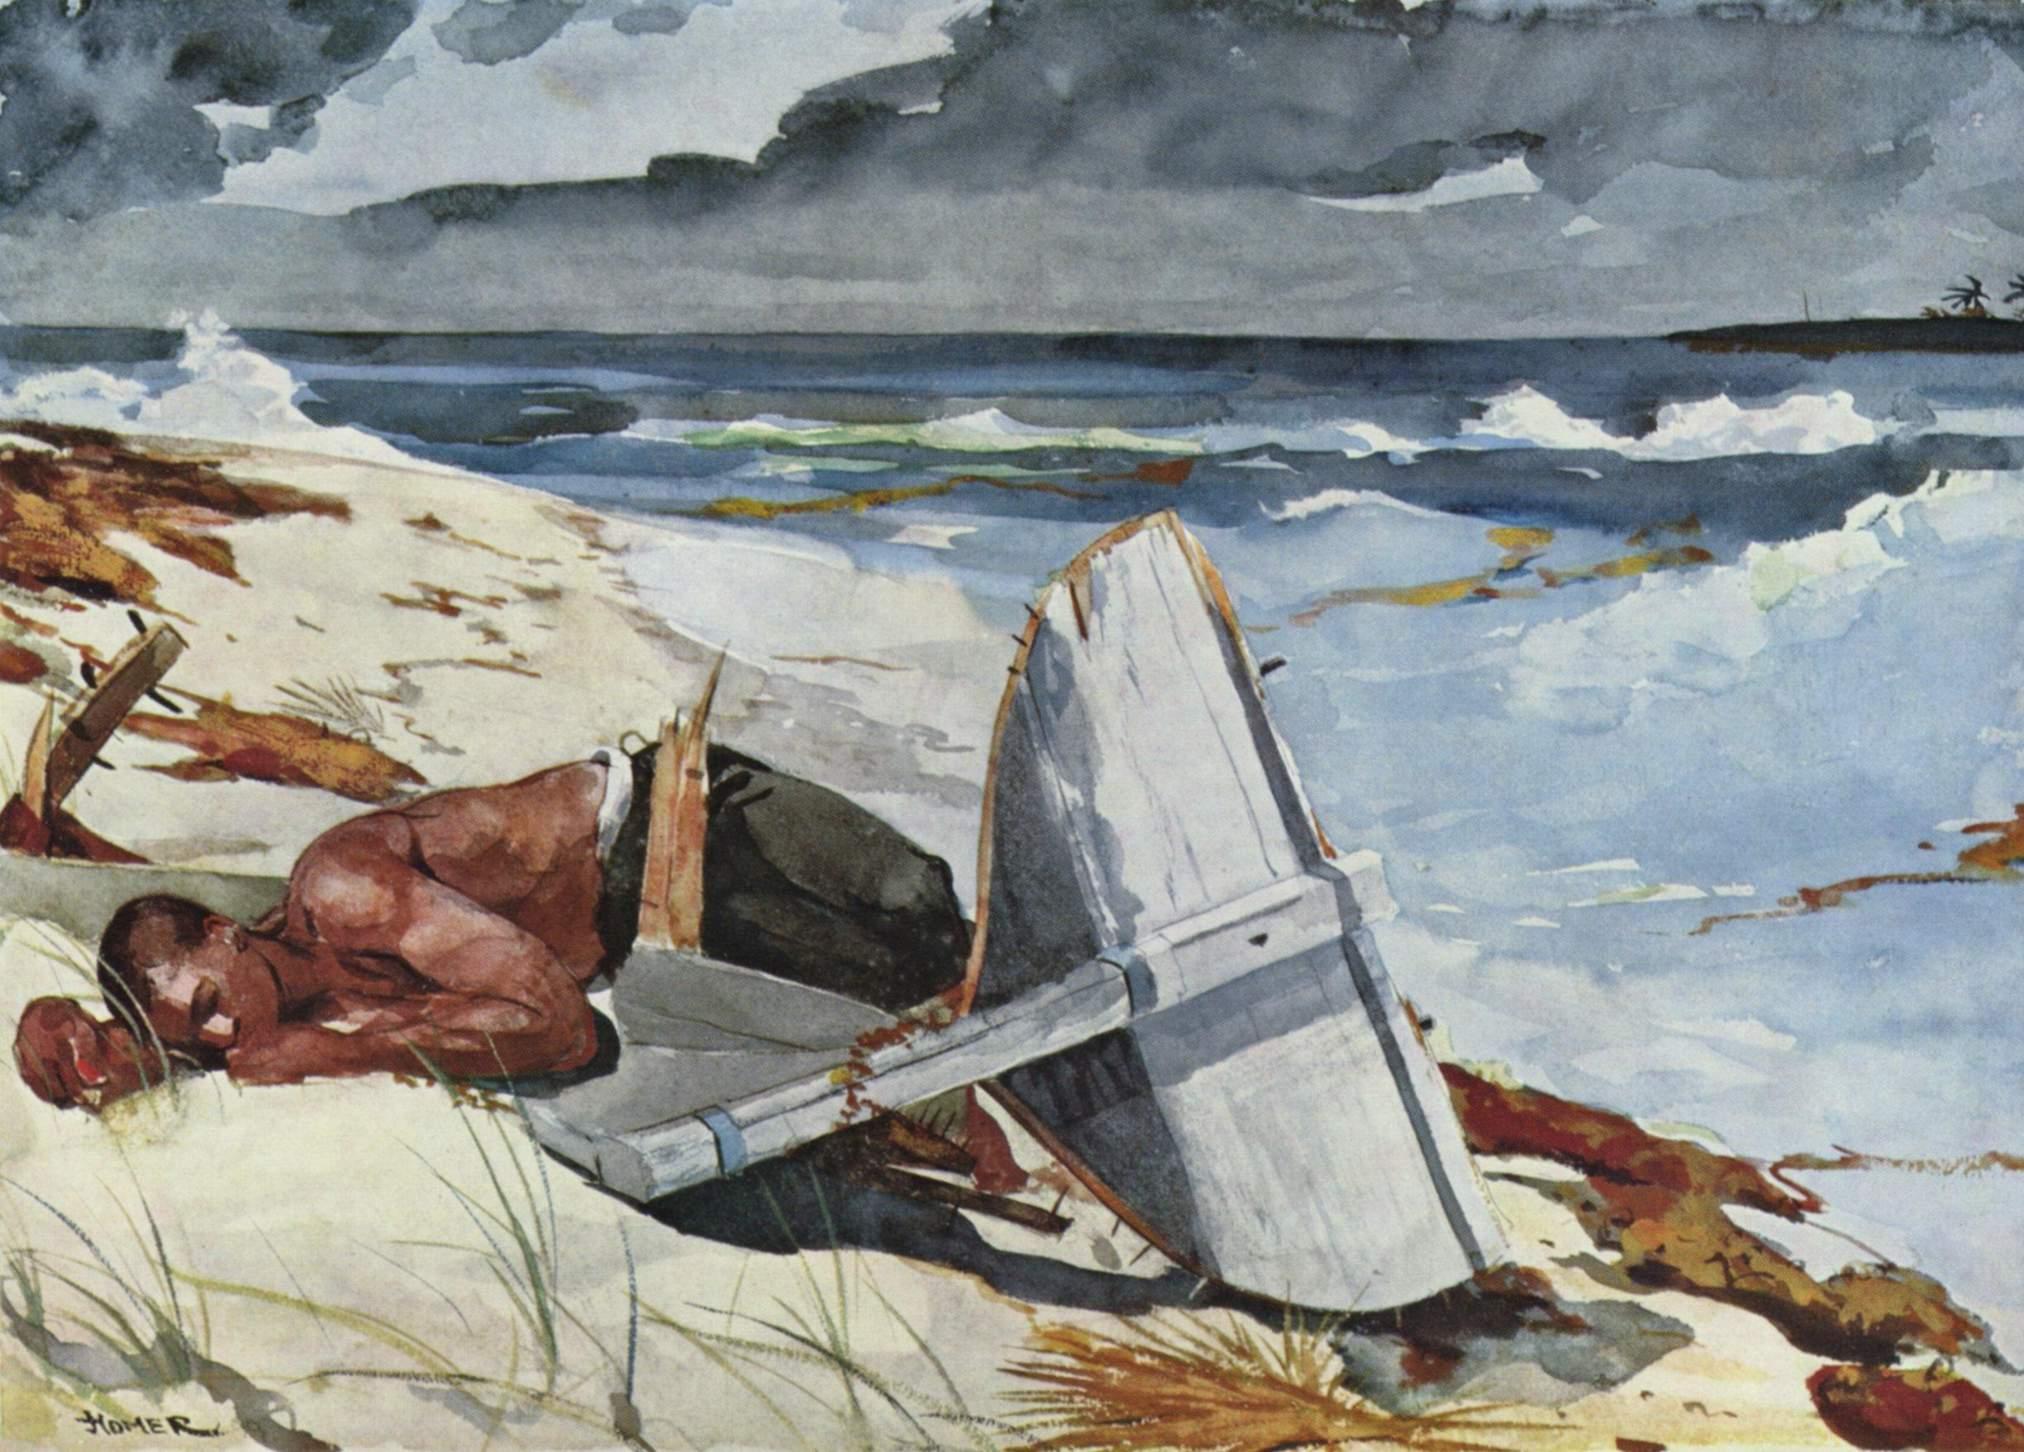 Watercolor artist magazine palm coast fl - Inspiring Art